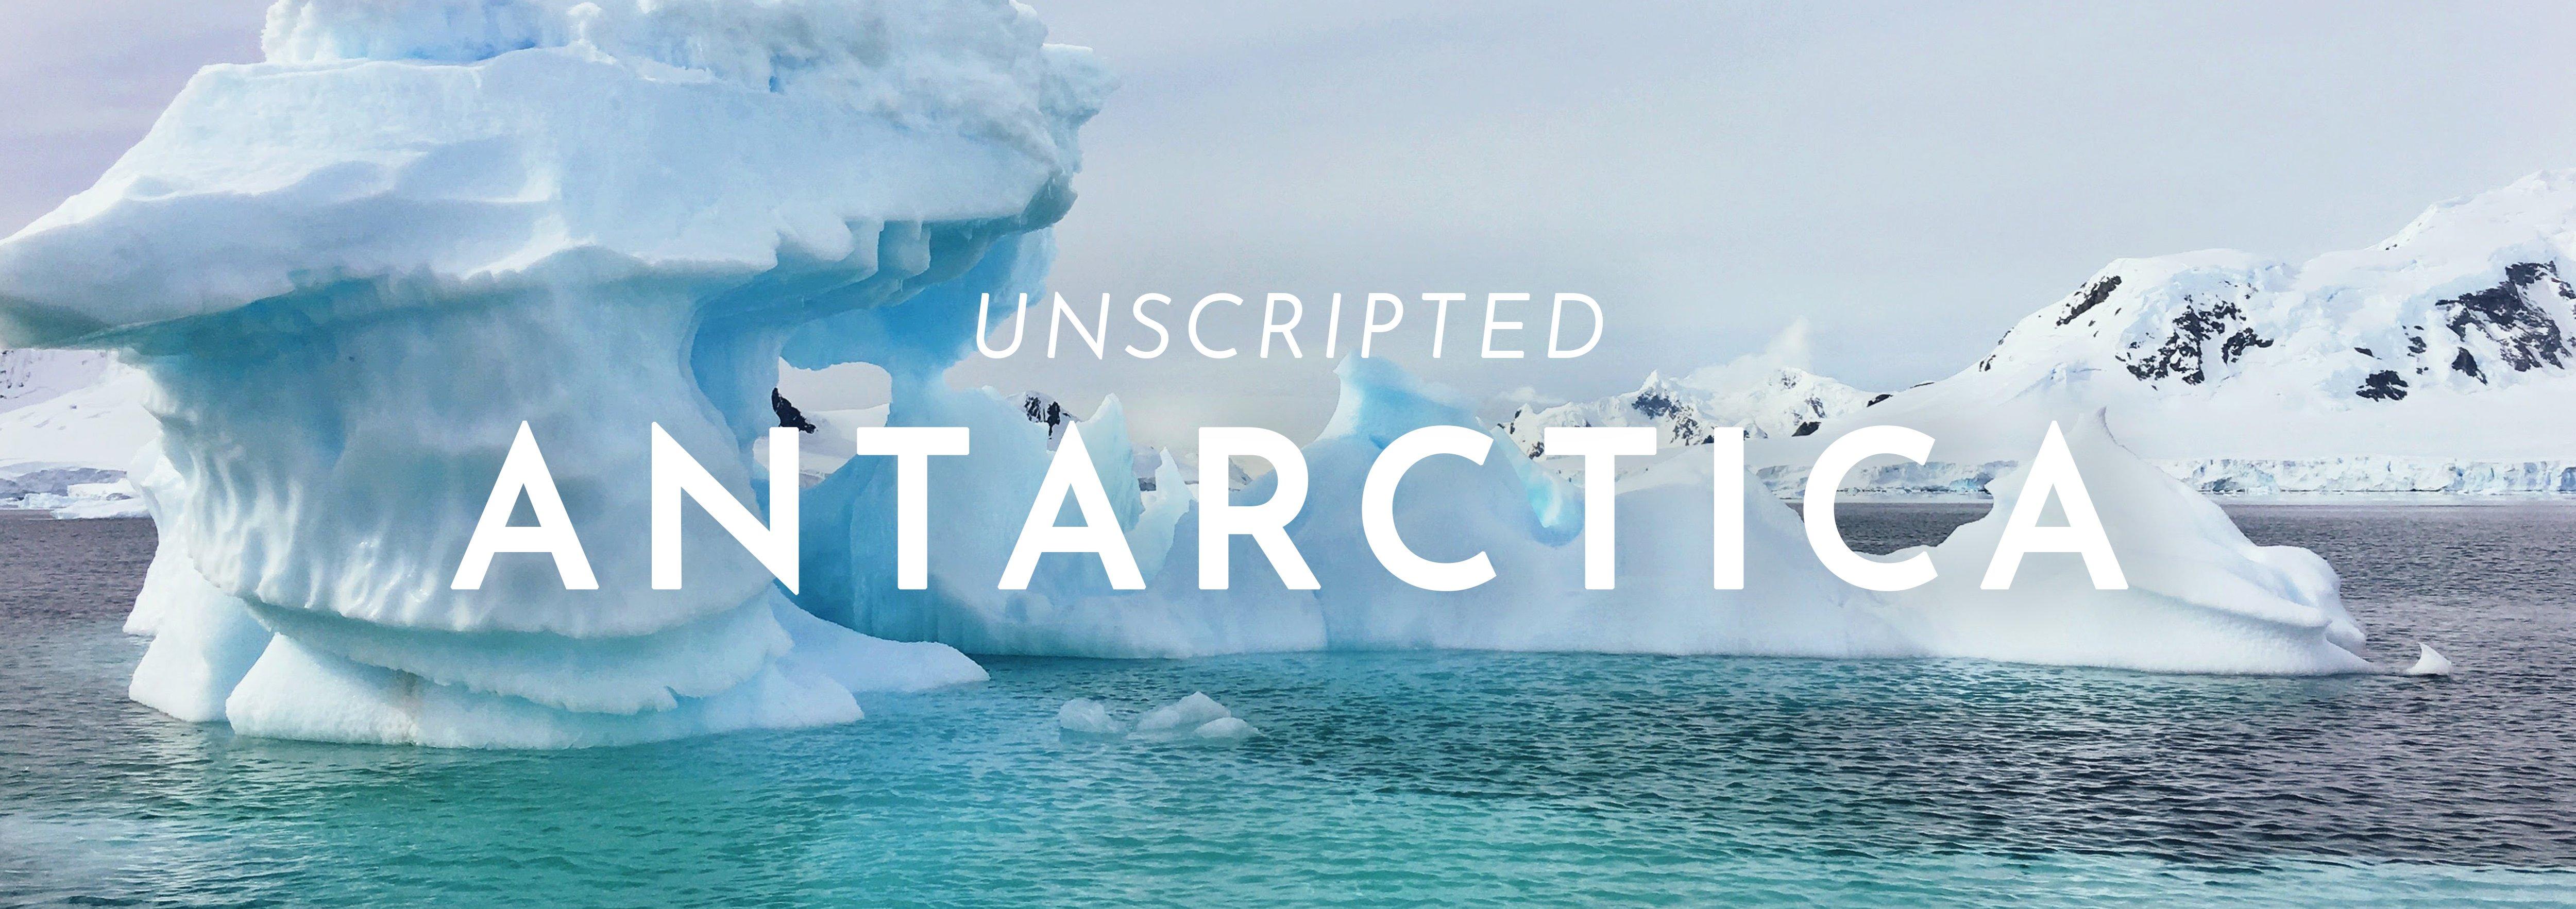 AntarcticaHeader